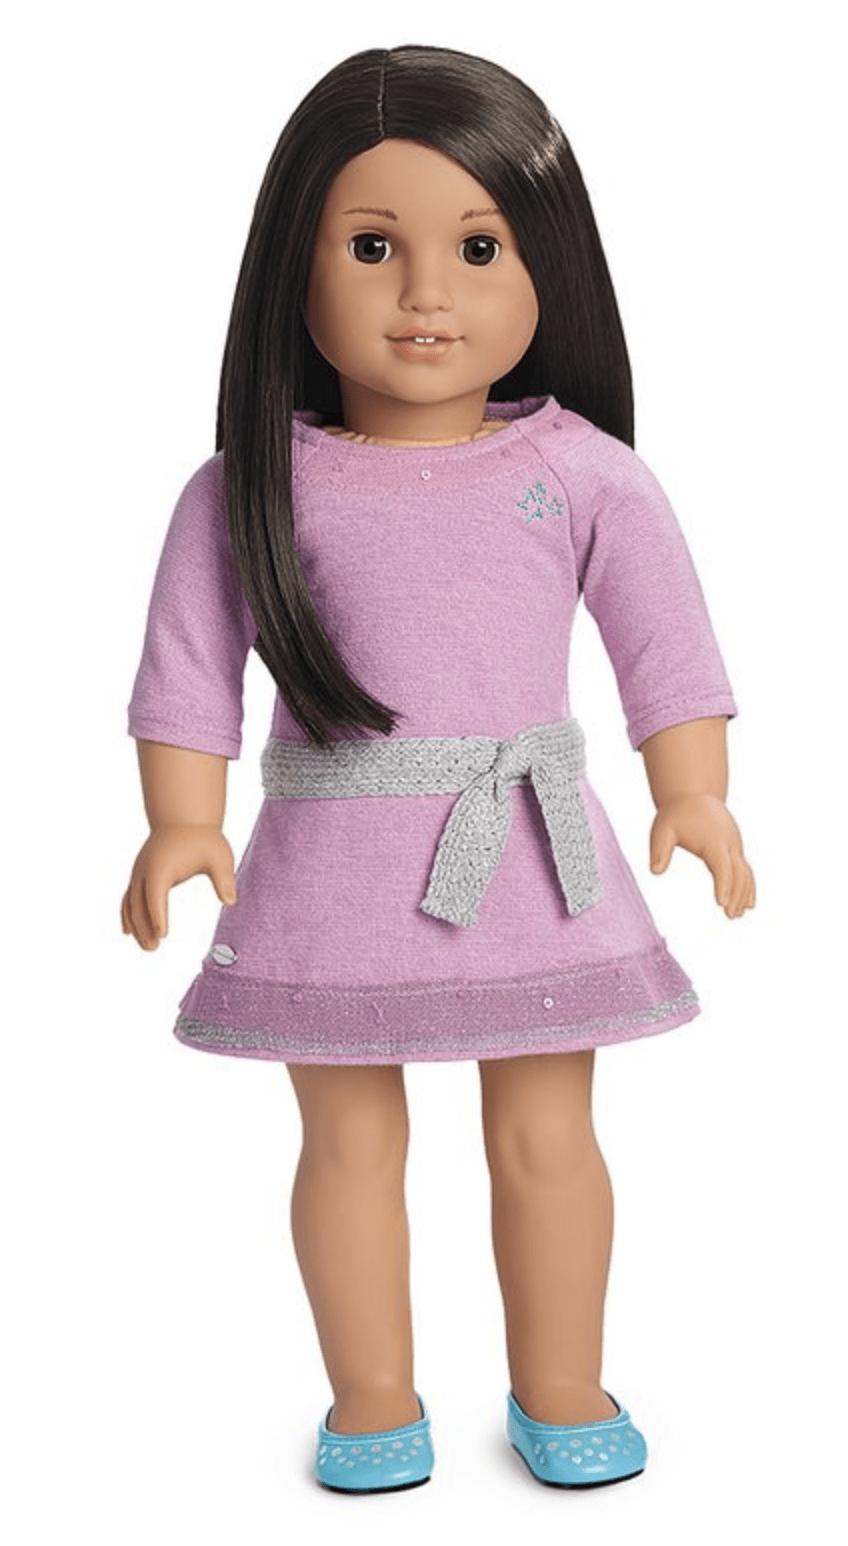 American Girl Doll Dress & Shoes